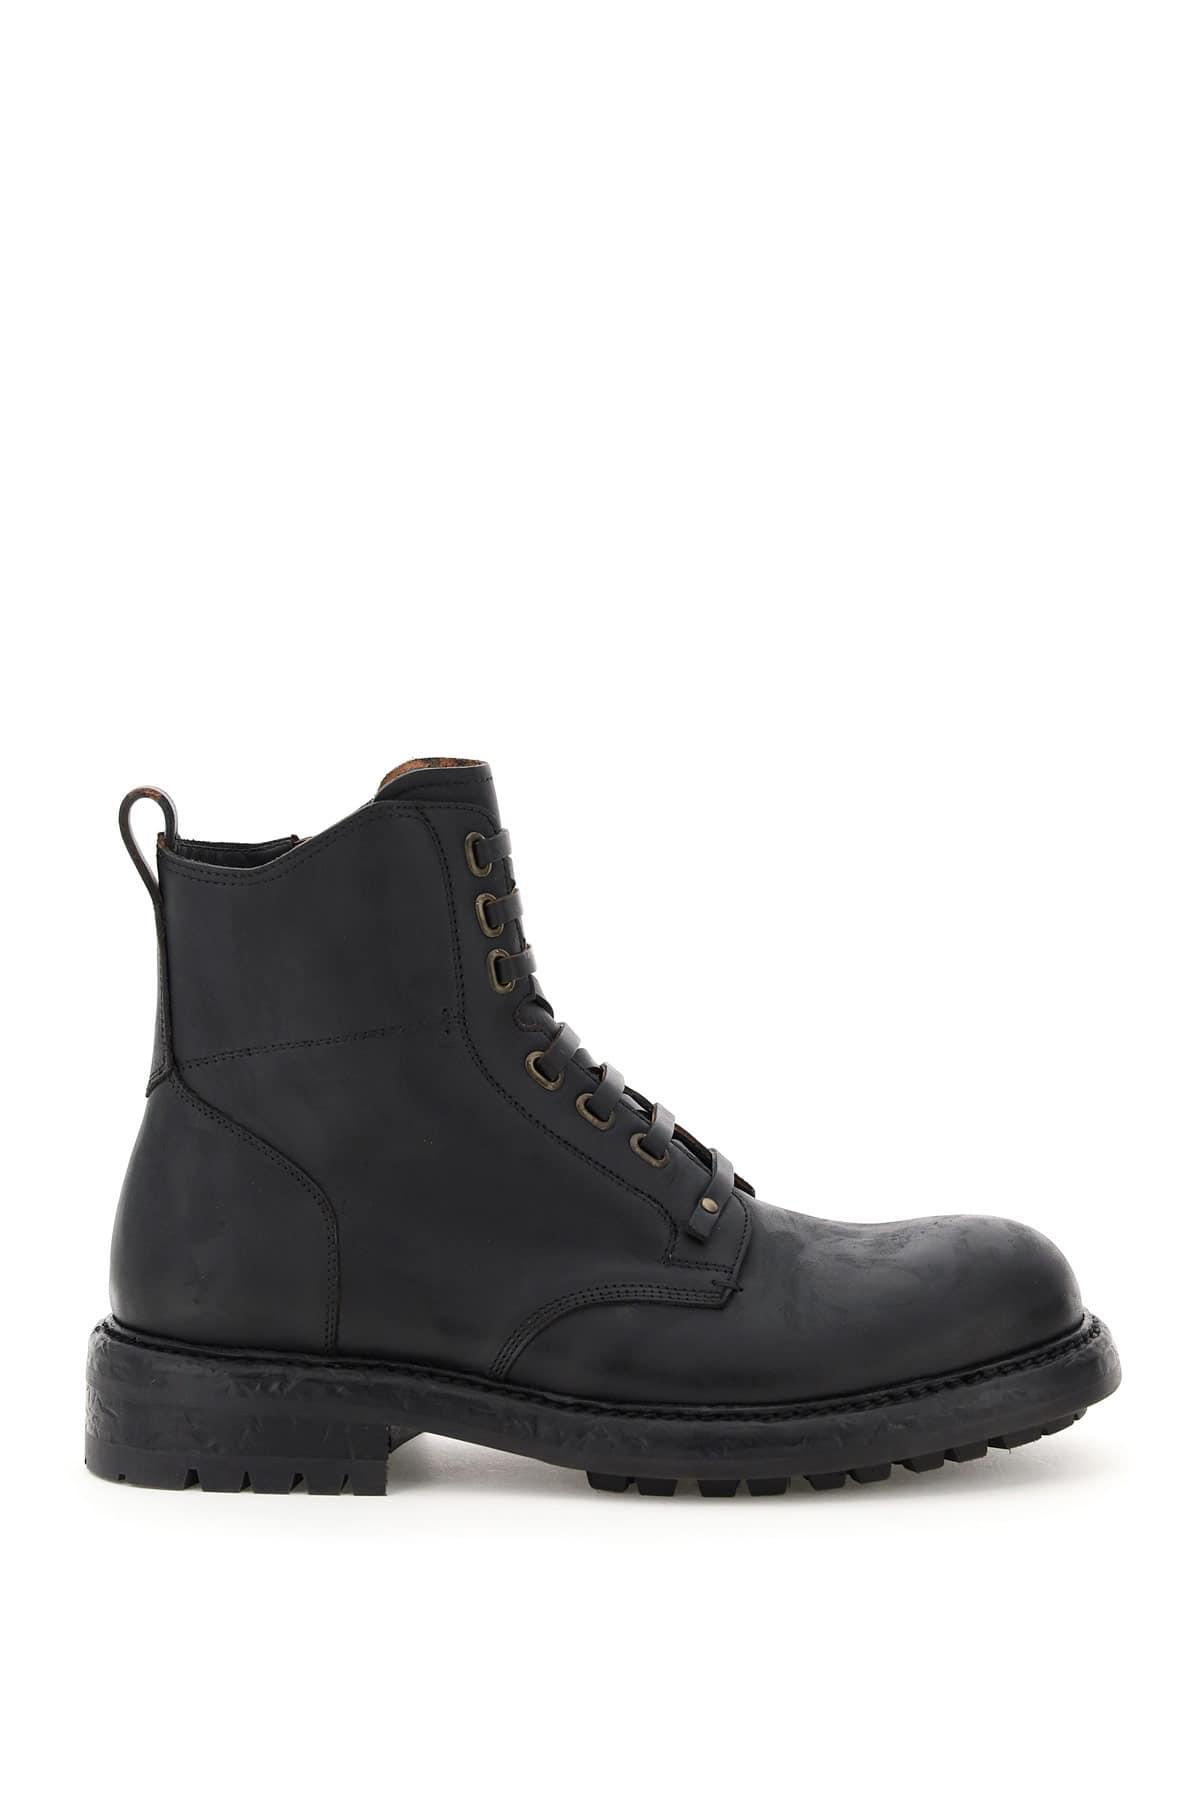 DOLCE & GABBANA BERNINI LACE-UP BOOTS 42 Black Leather